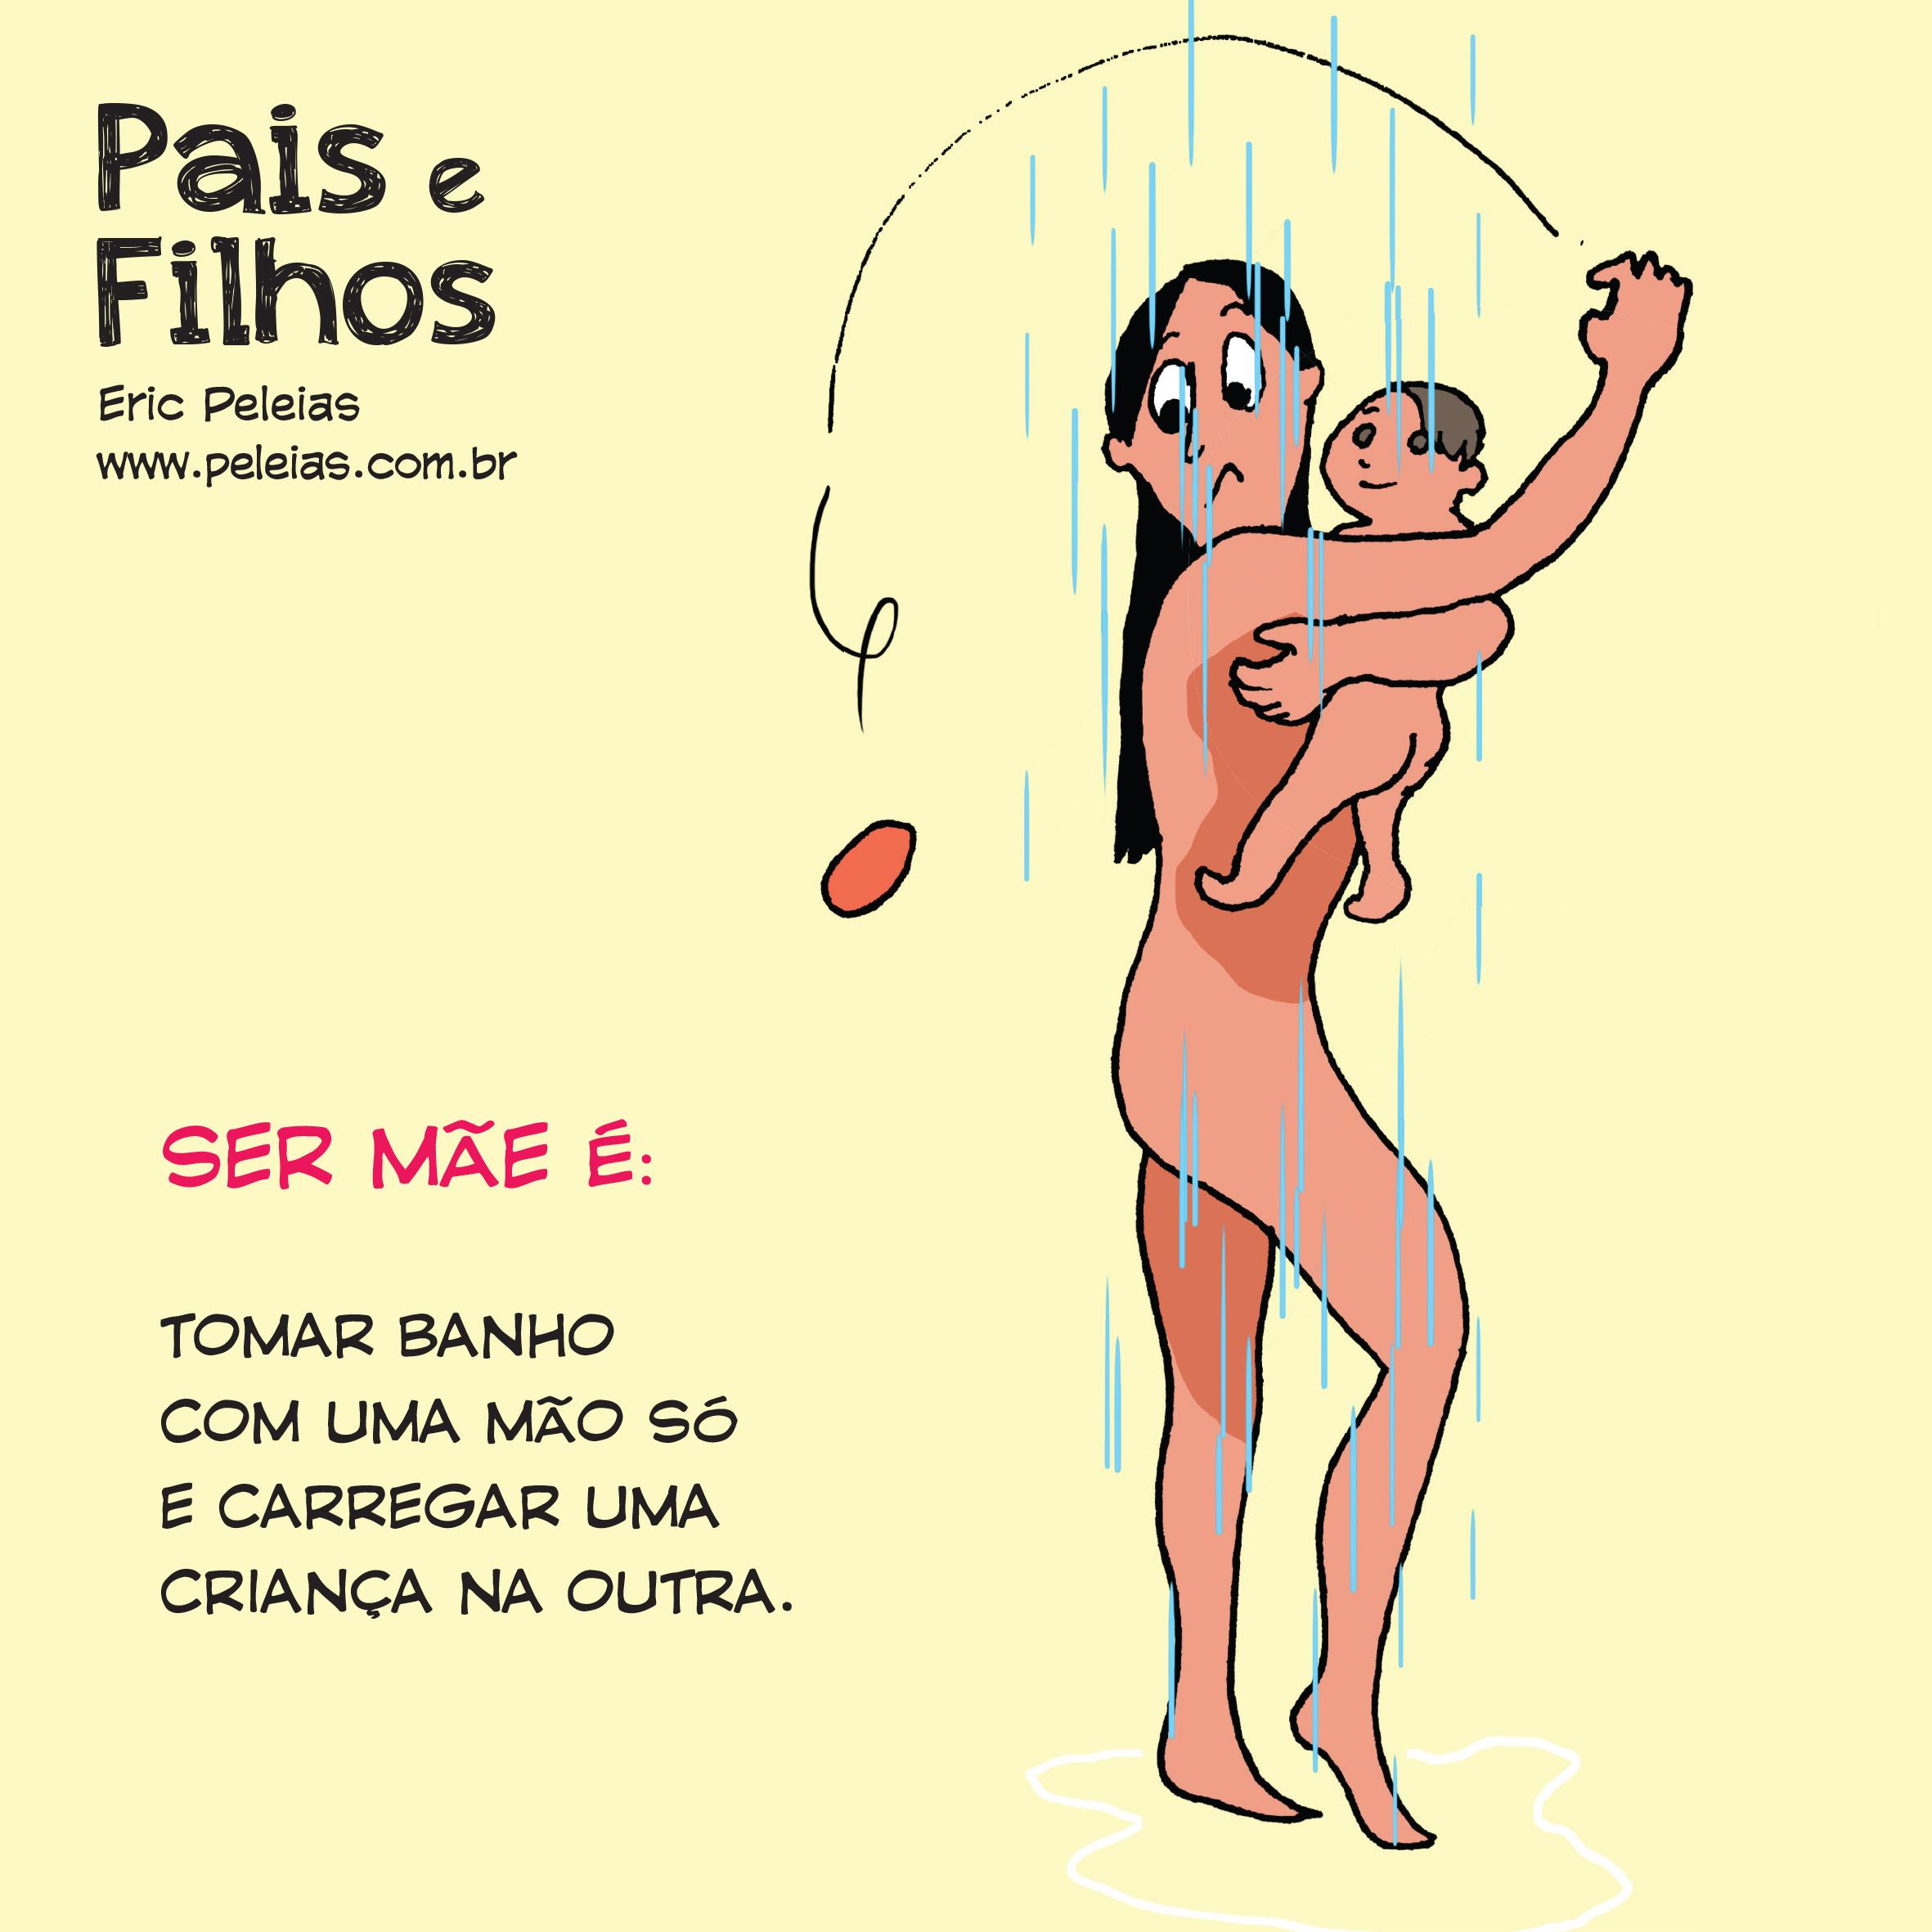 paiseflhos_33-1